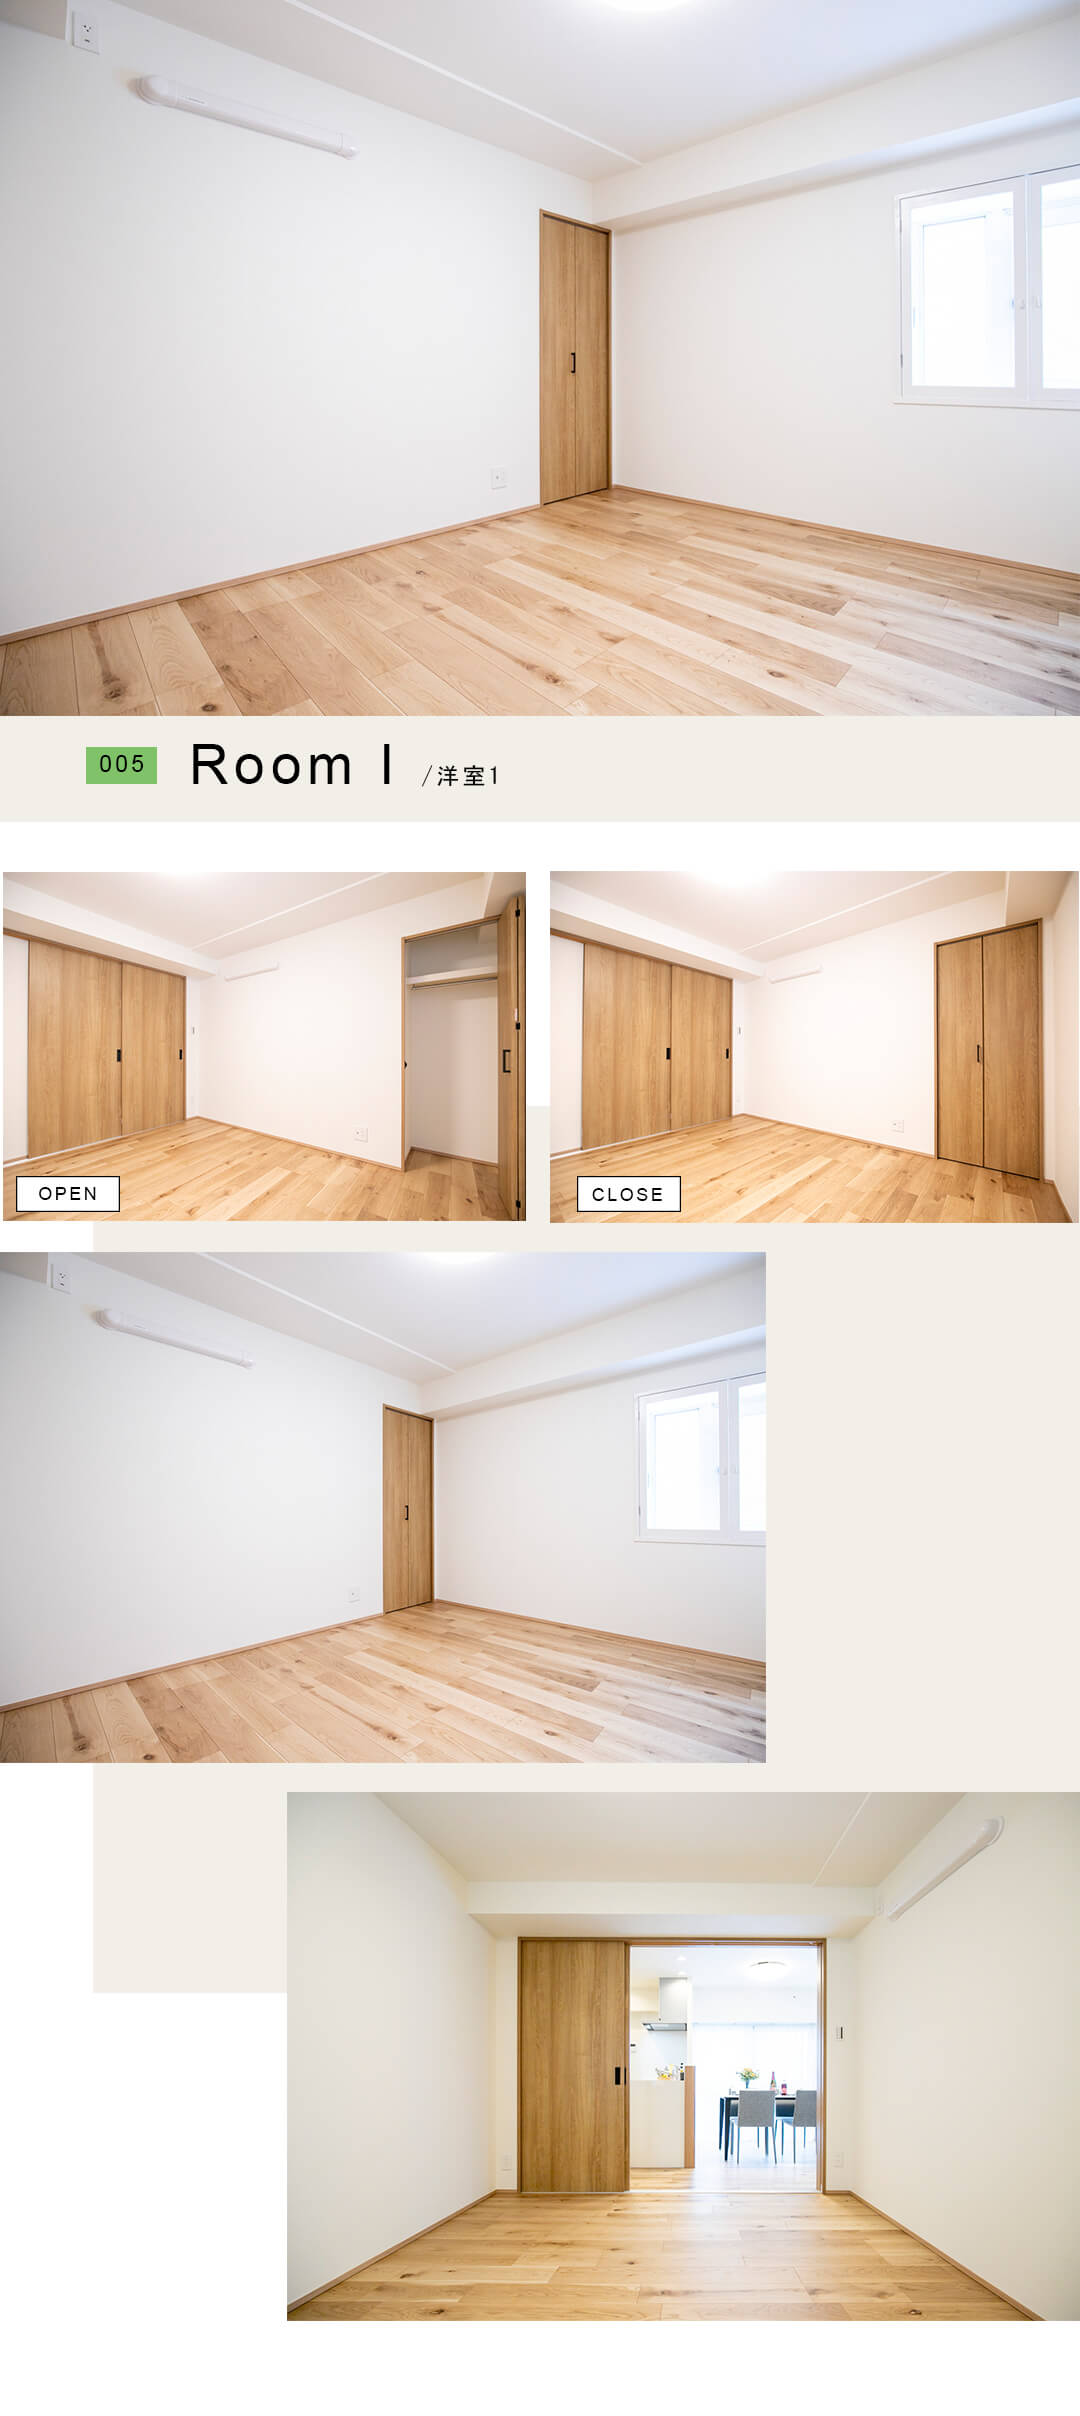 005,RoomI,洋室1